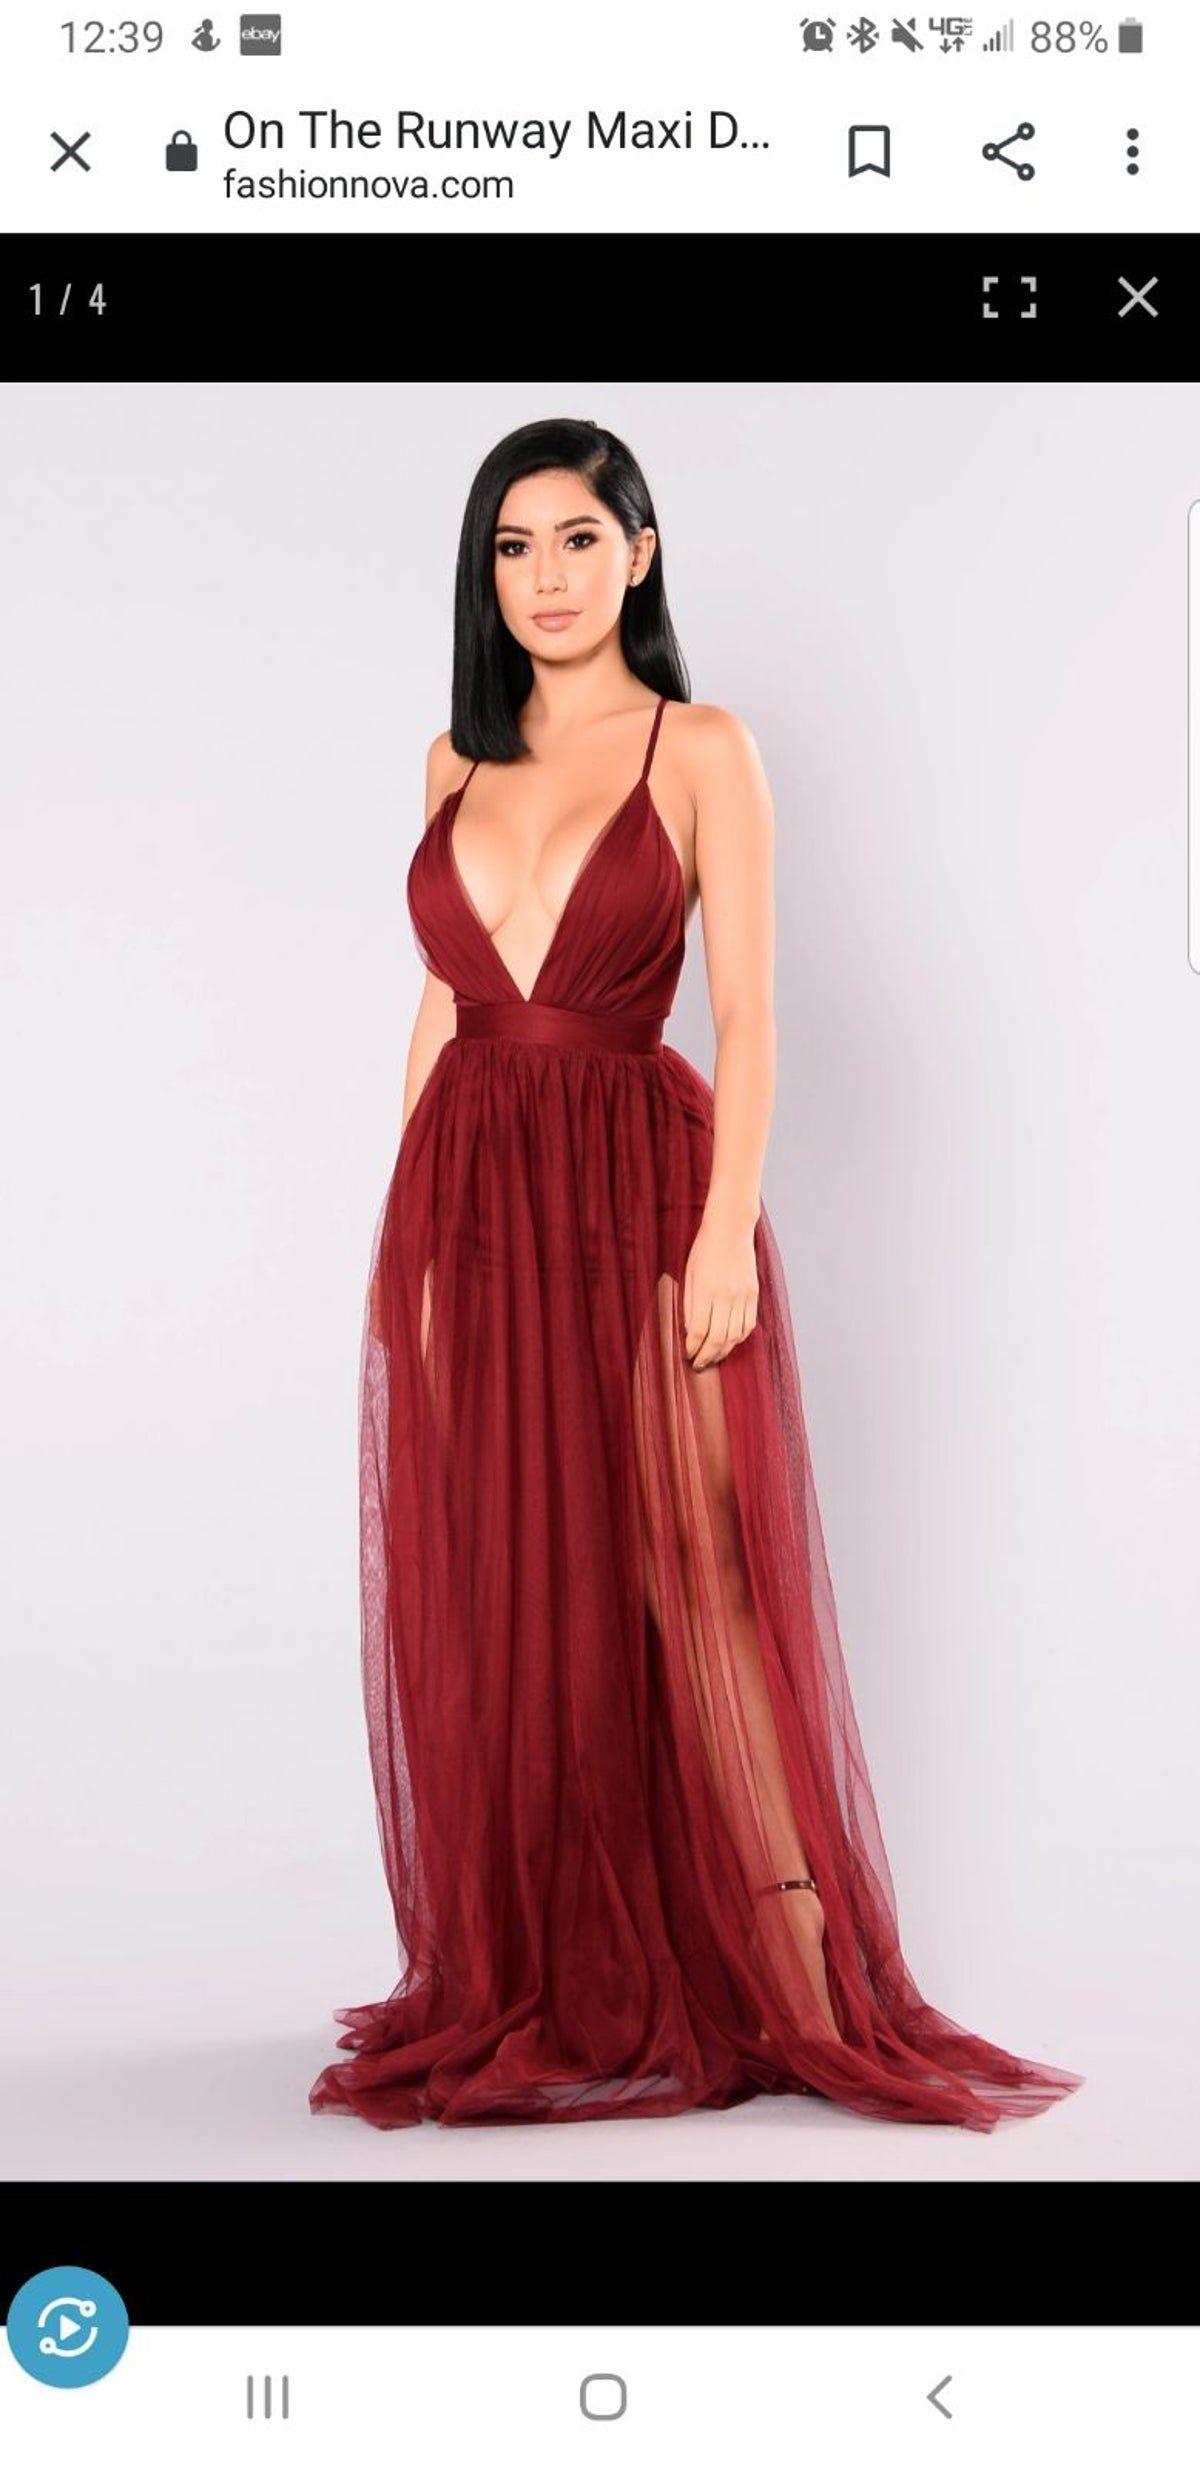 Long Formal Dress In 2021 Formal Dresses Long Dresses Formal Dresses [ 2466 x 1200 Pixel ]